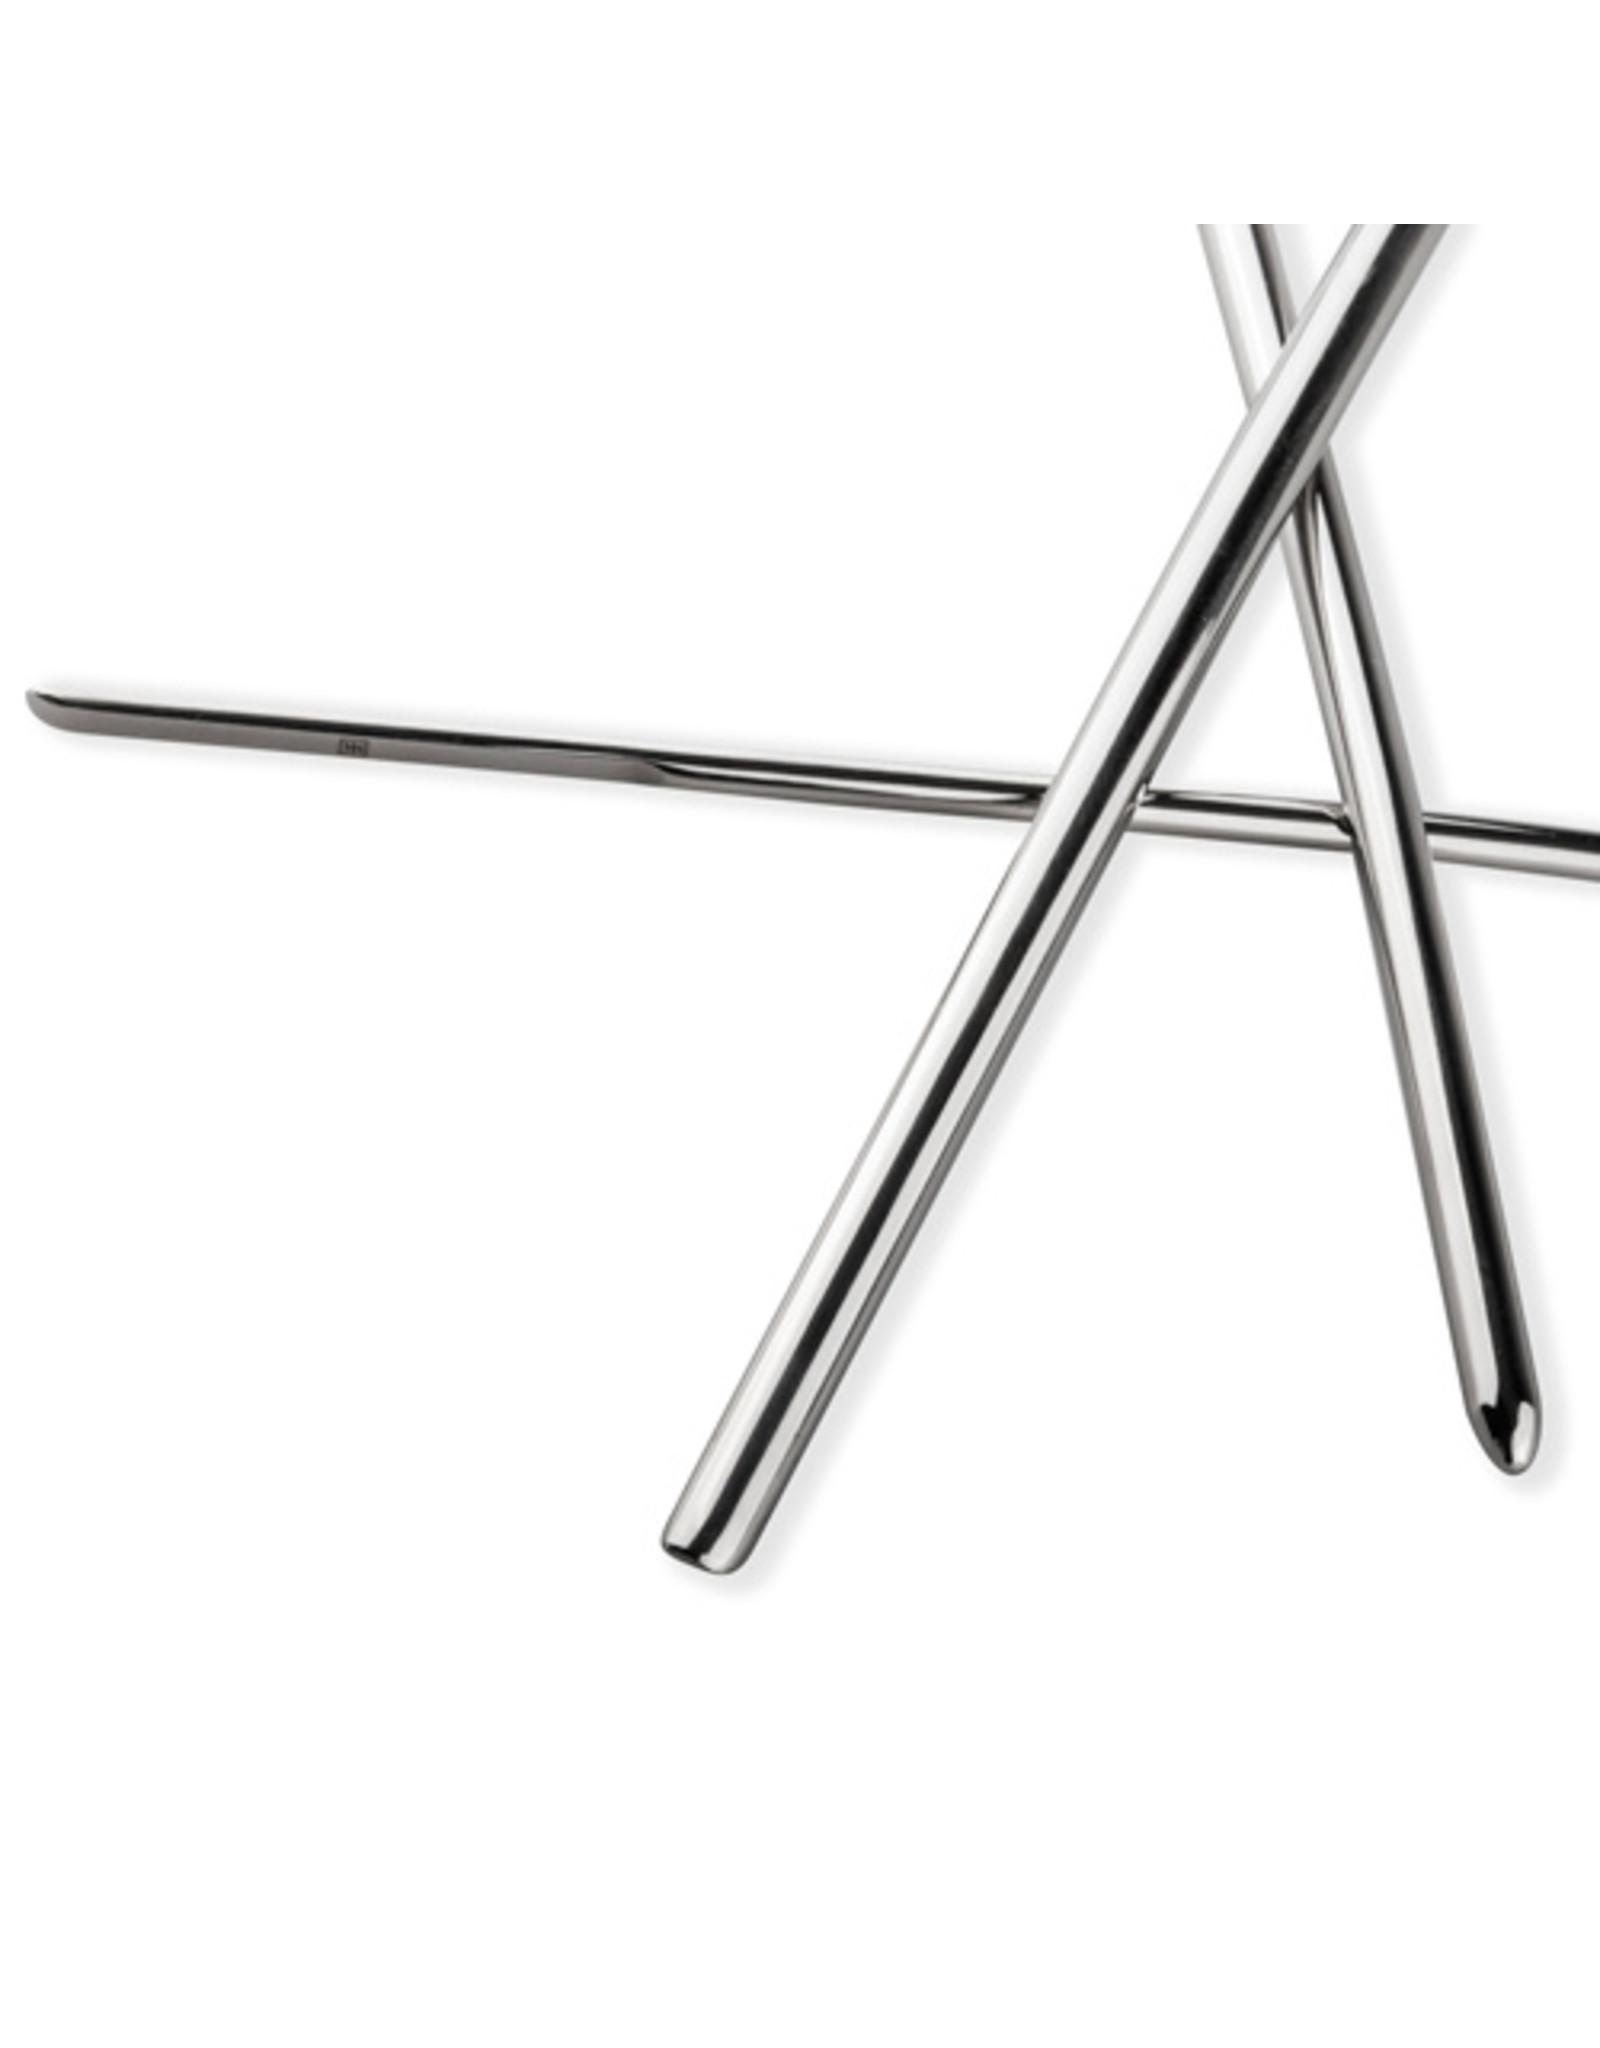 Sinner Gear Unbendable Dilator Set Met Plat Handvat 14 Stuks - 4 mm - 17 mm